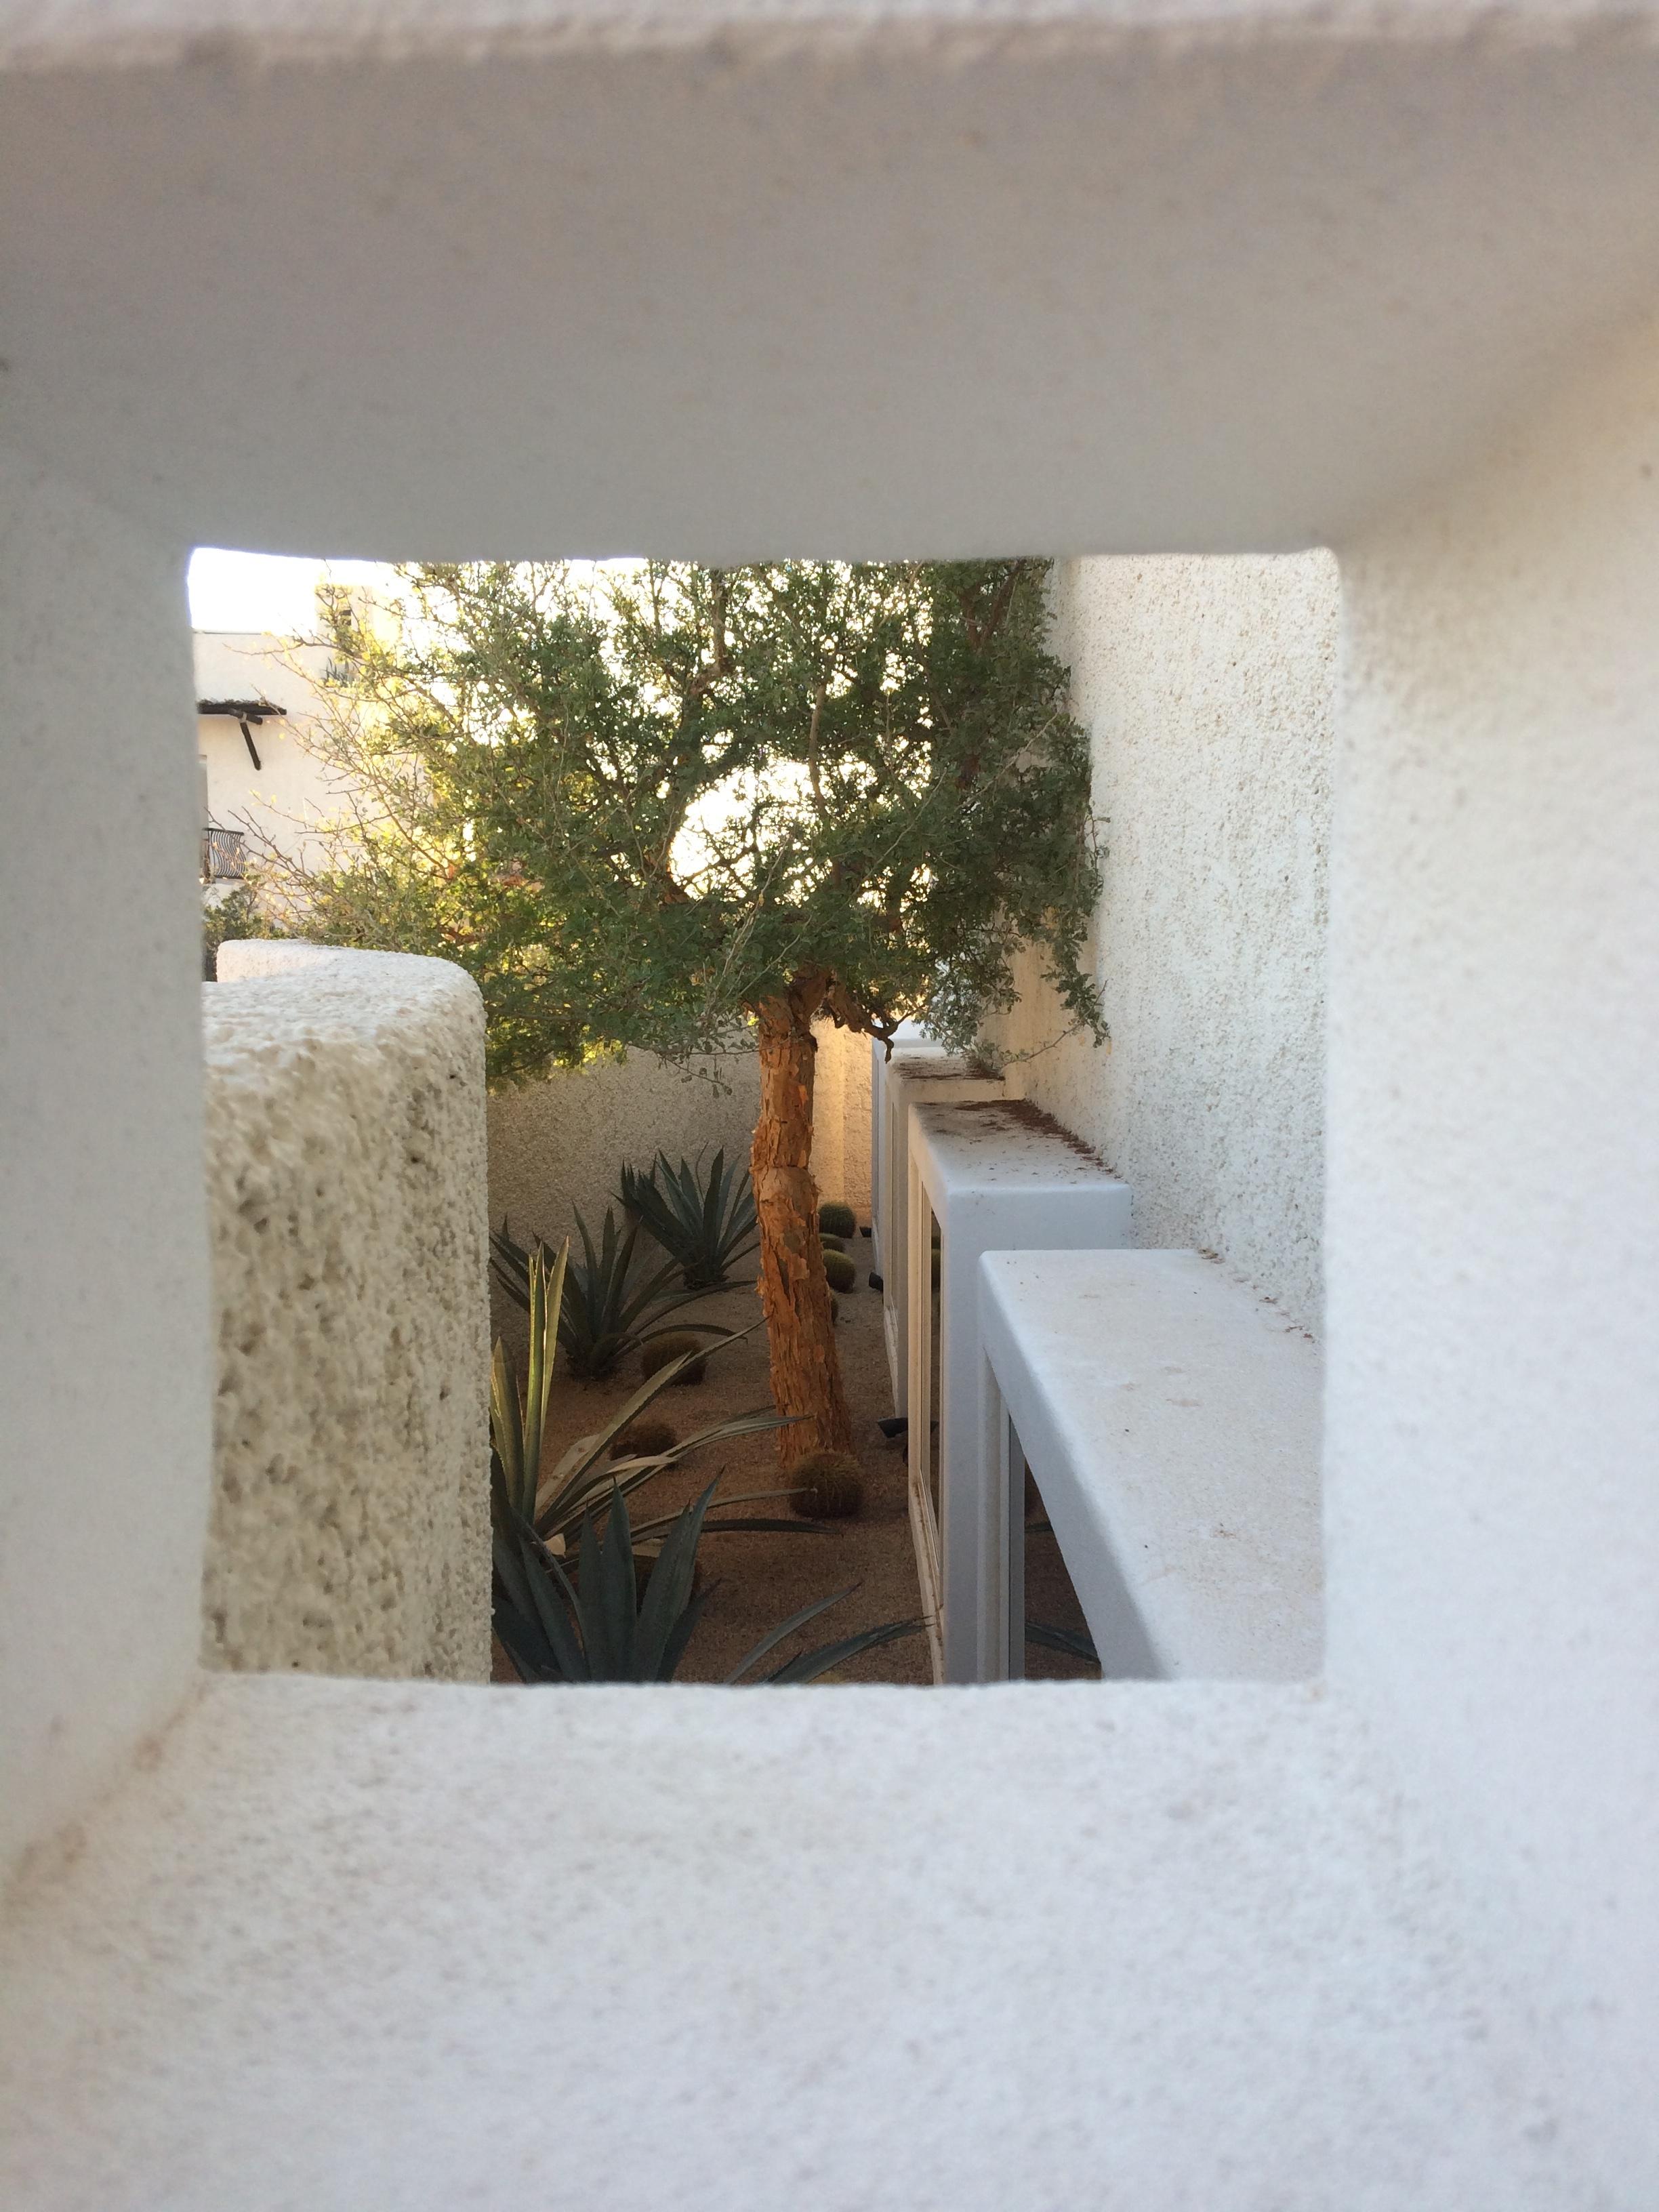 Outside the moon studio, a sweet, hidden desert topiary.